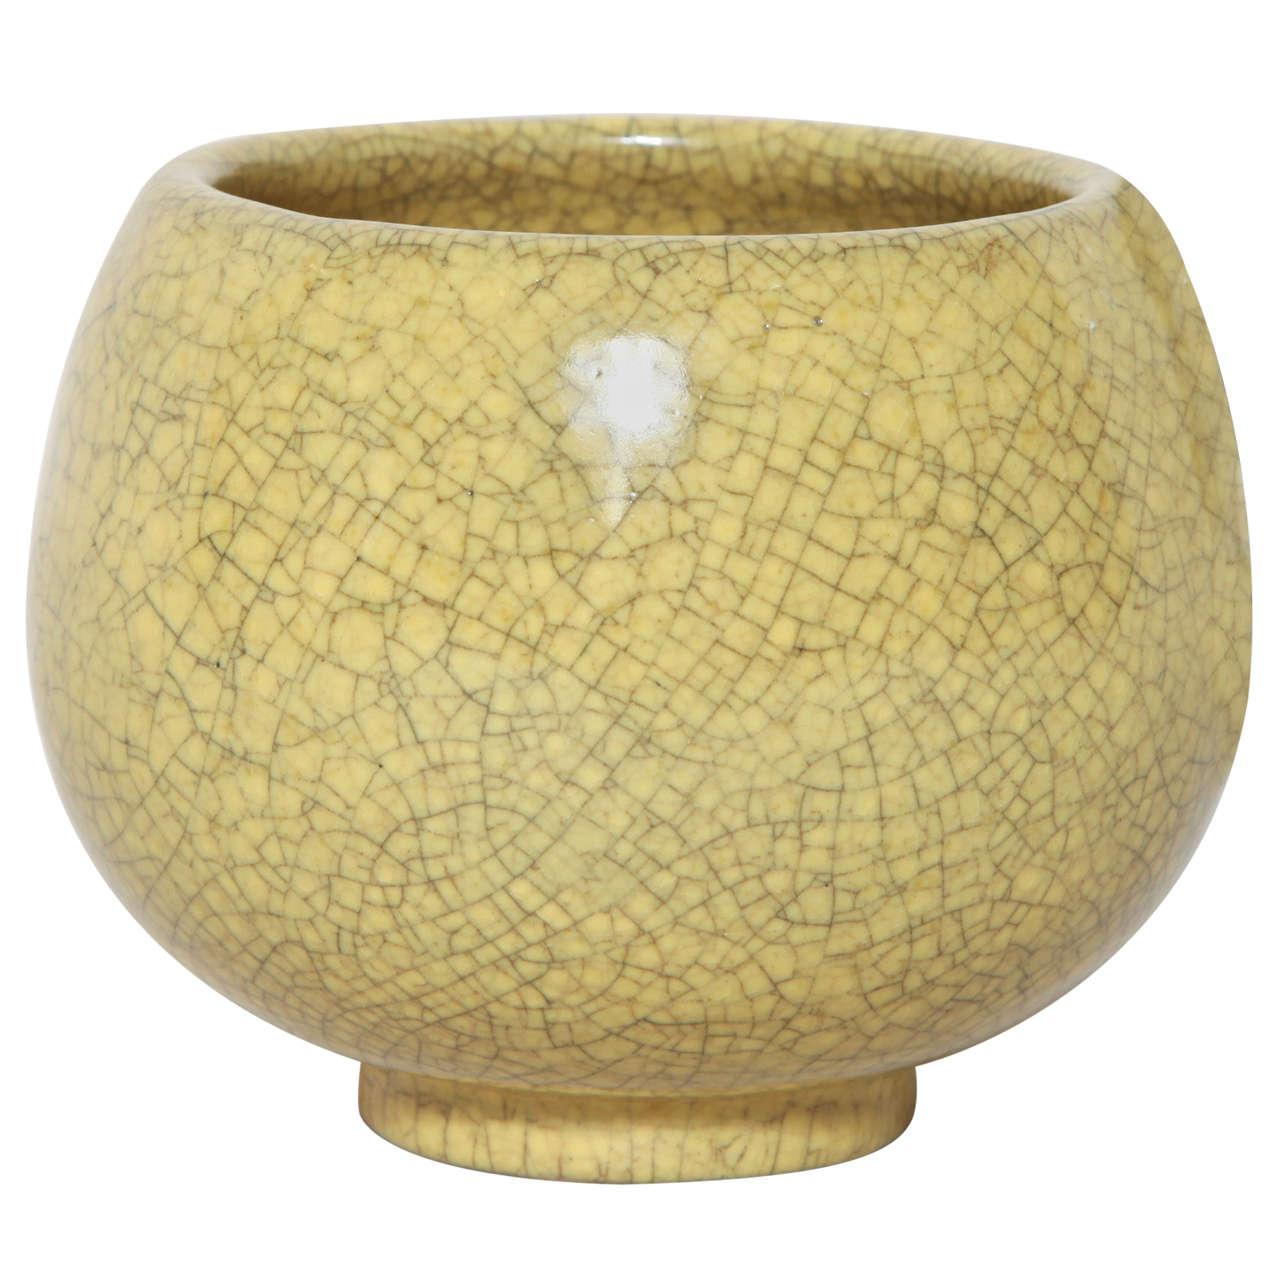 Henri Simmen stoneware coupe, 1923-1935